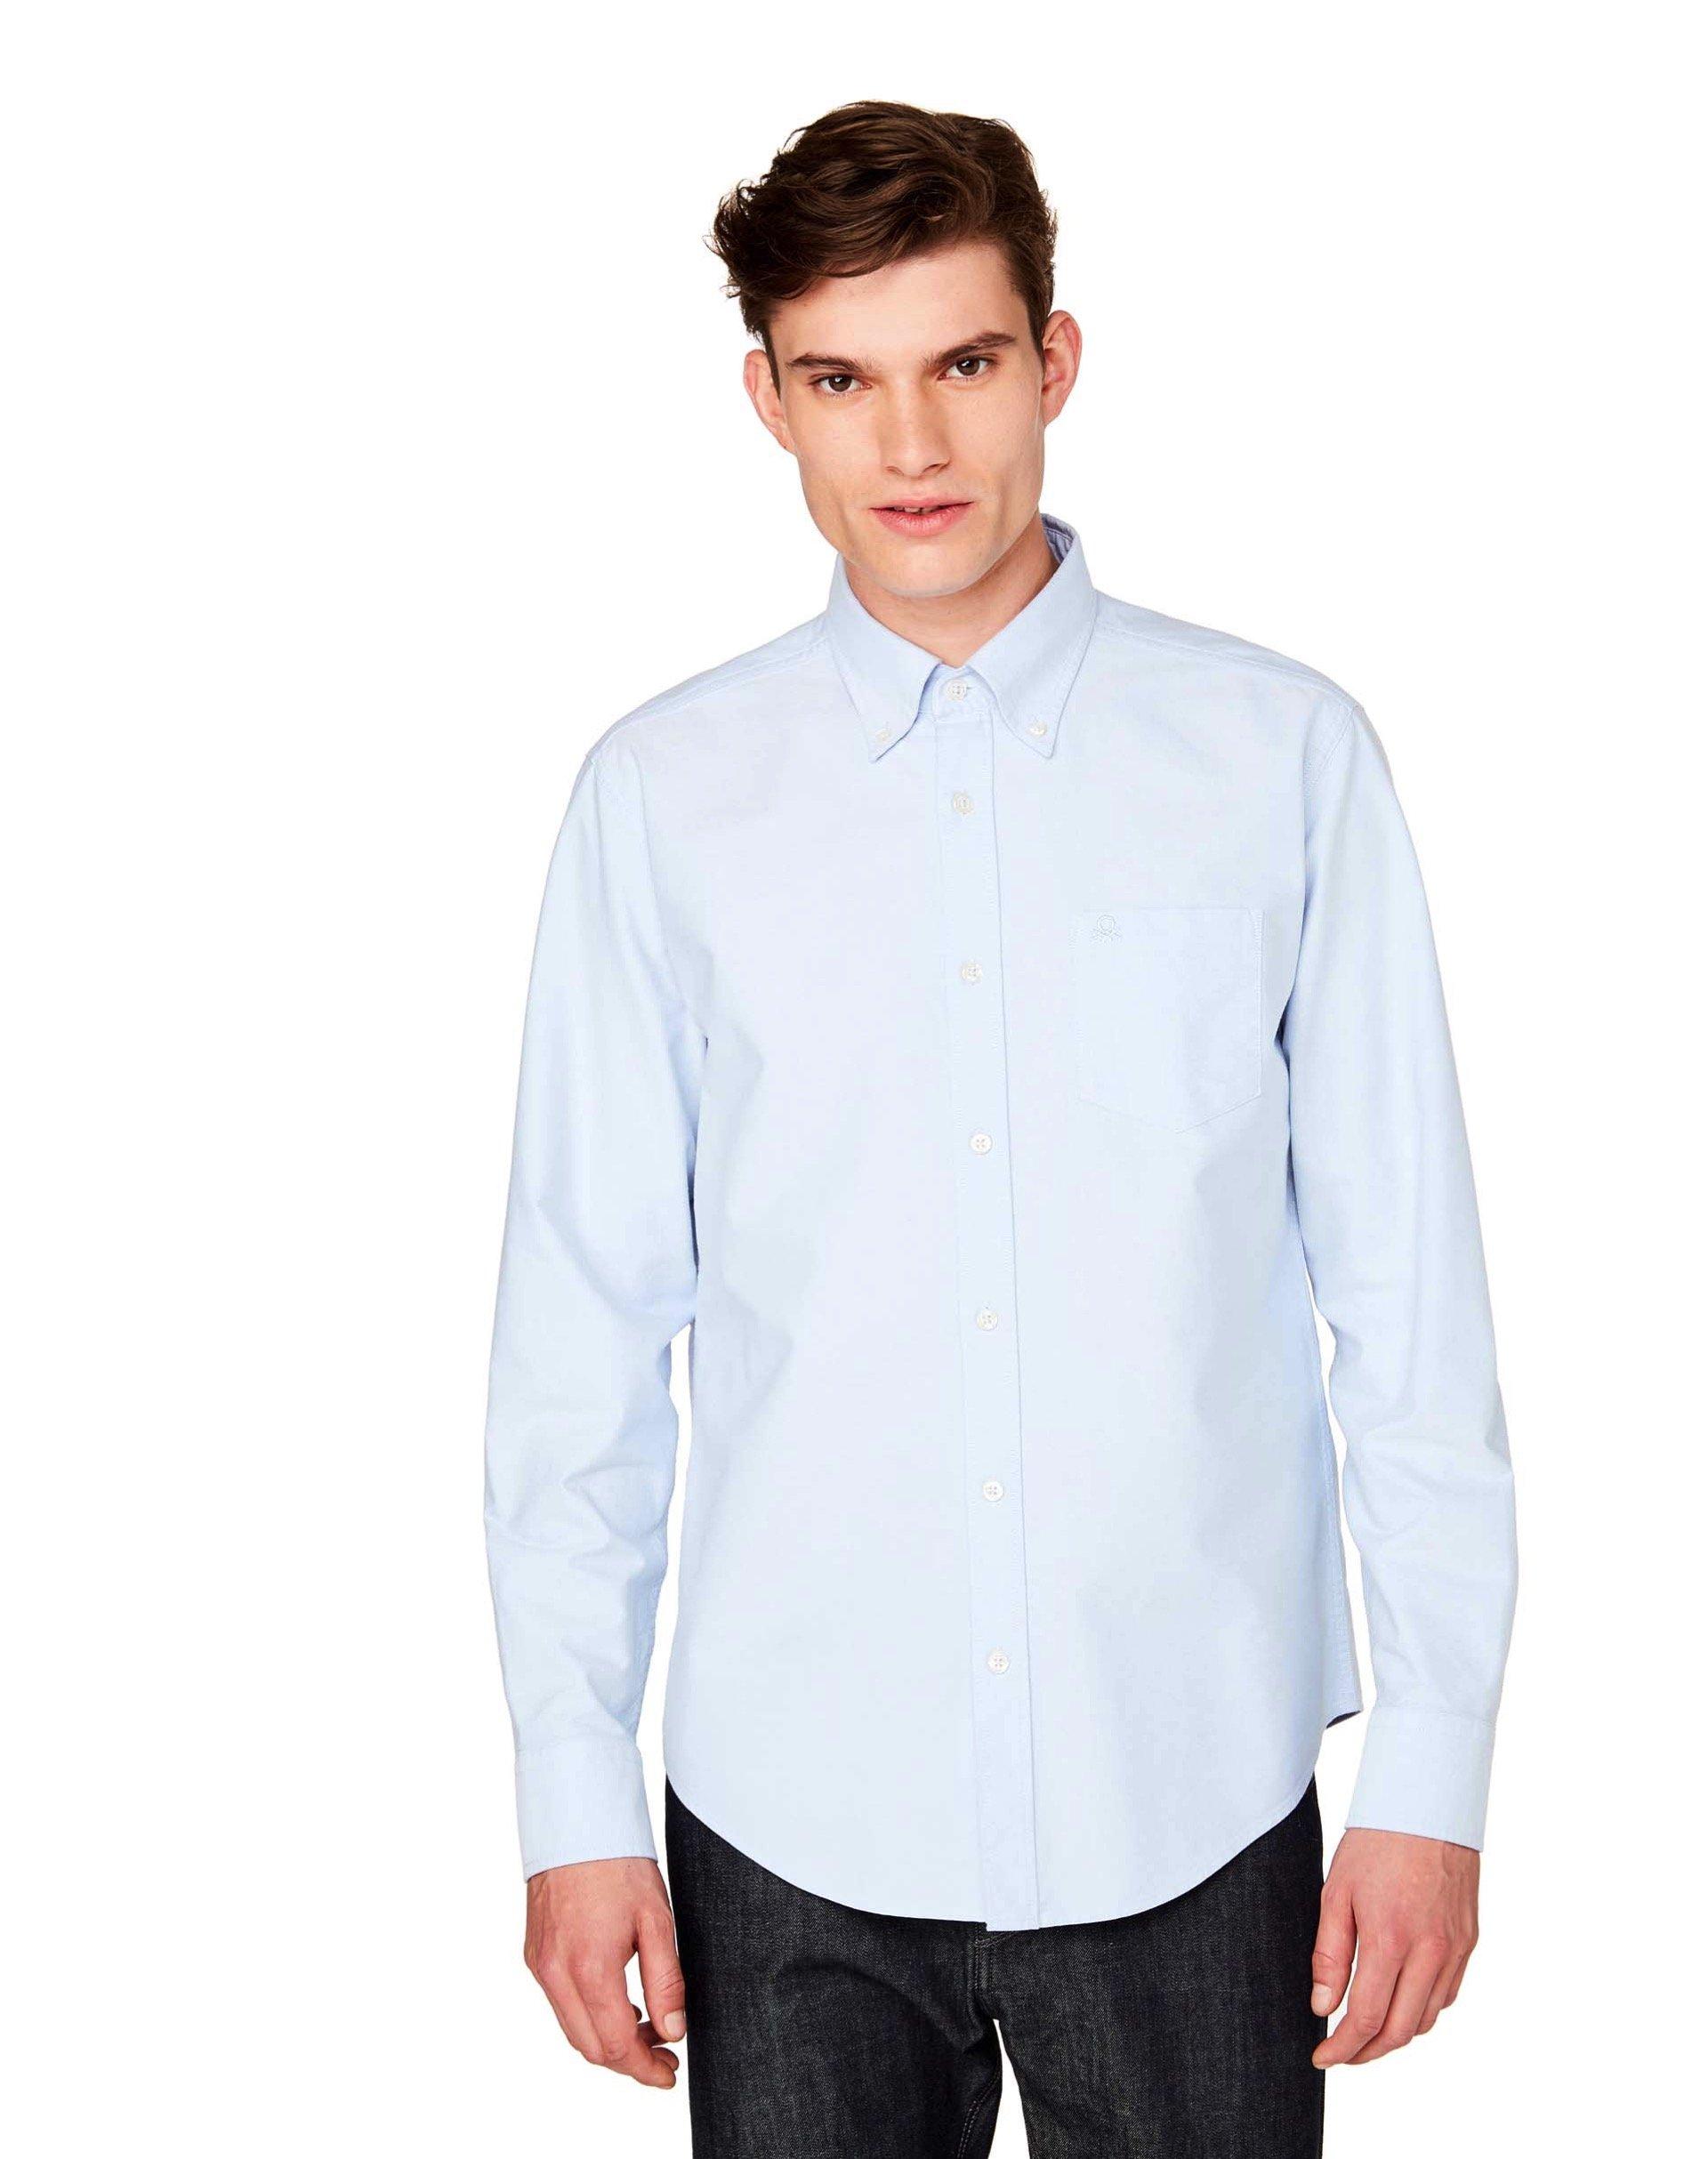 Рубашка из 100% хлопка Оксфорд от Benetton